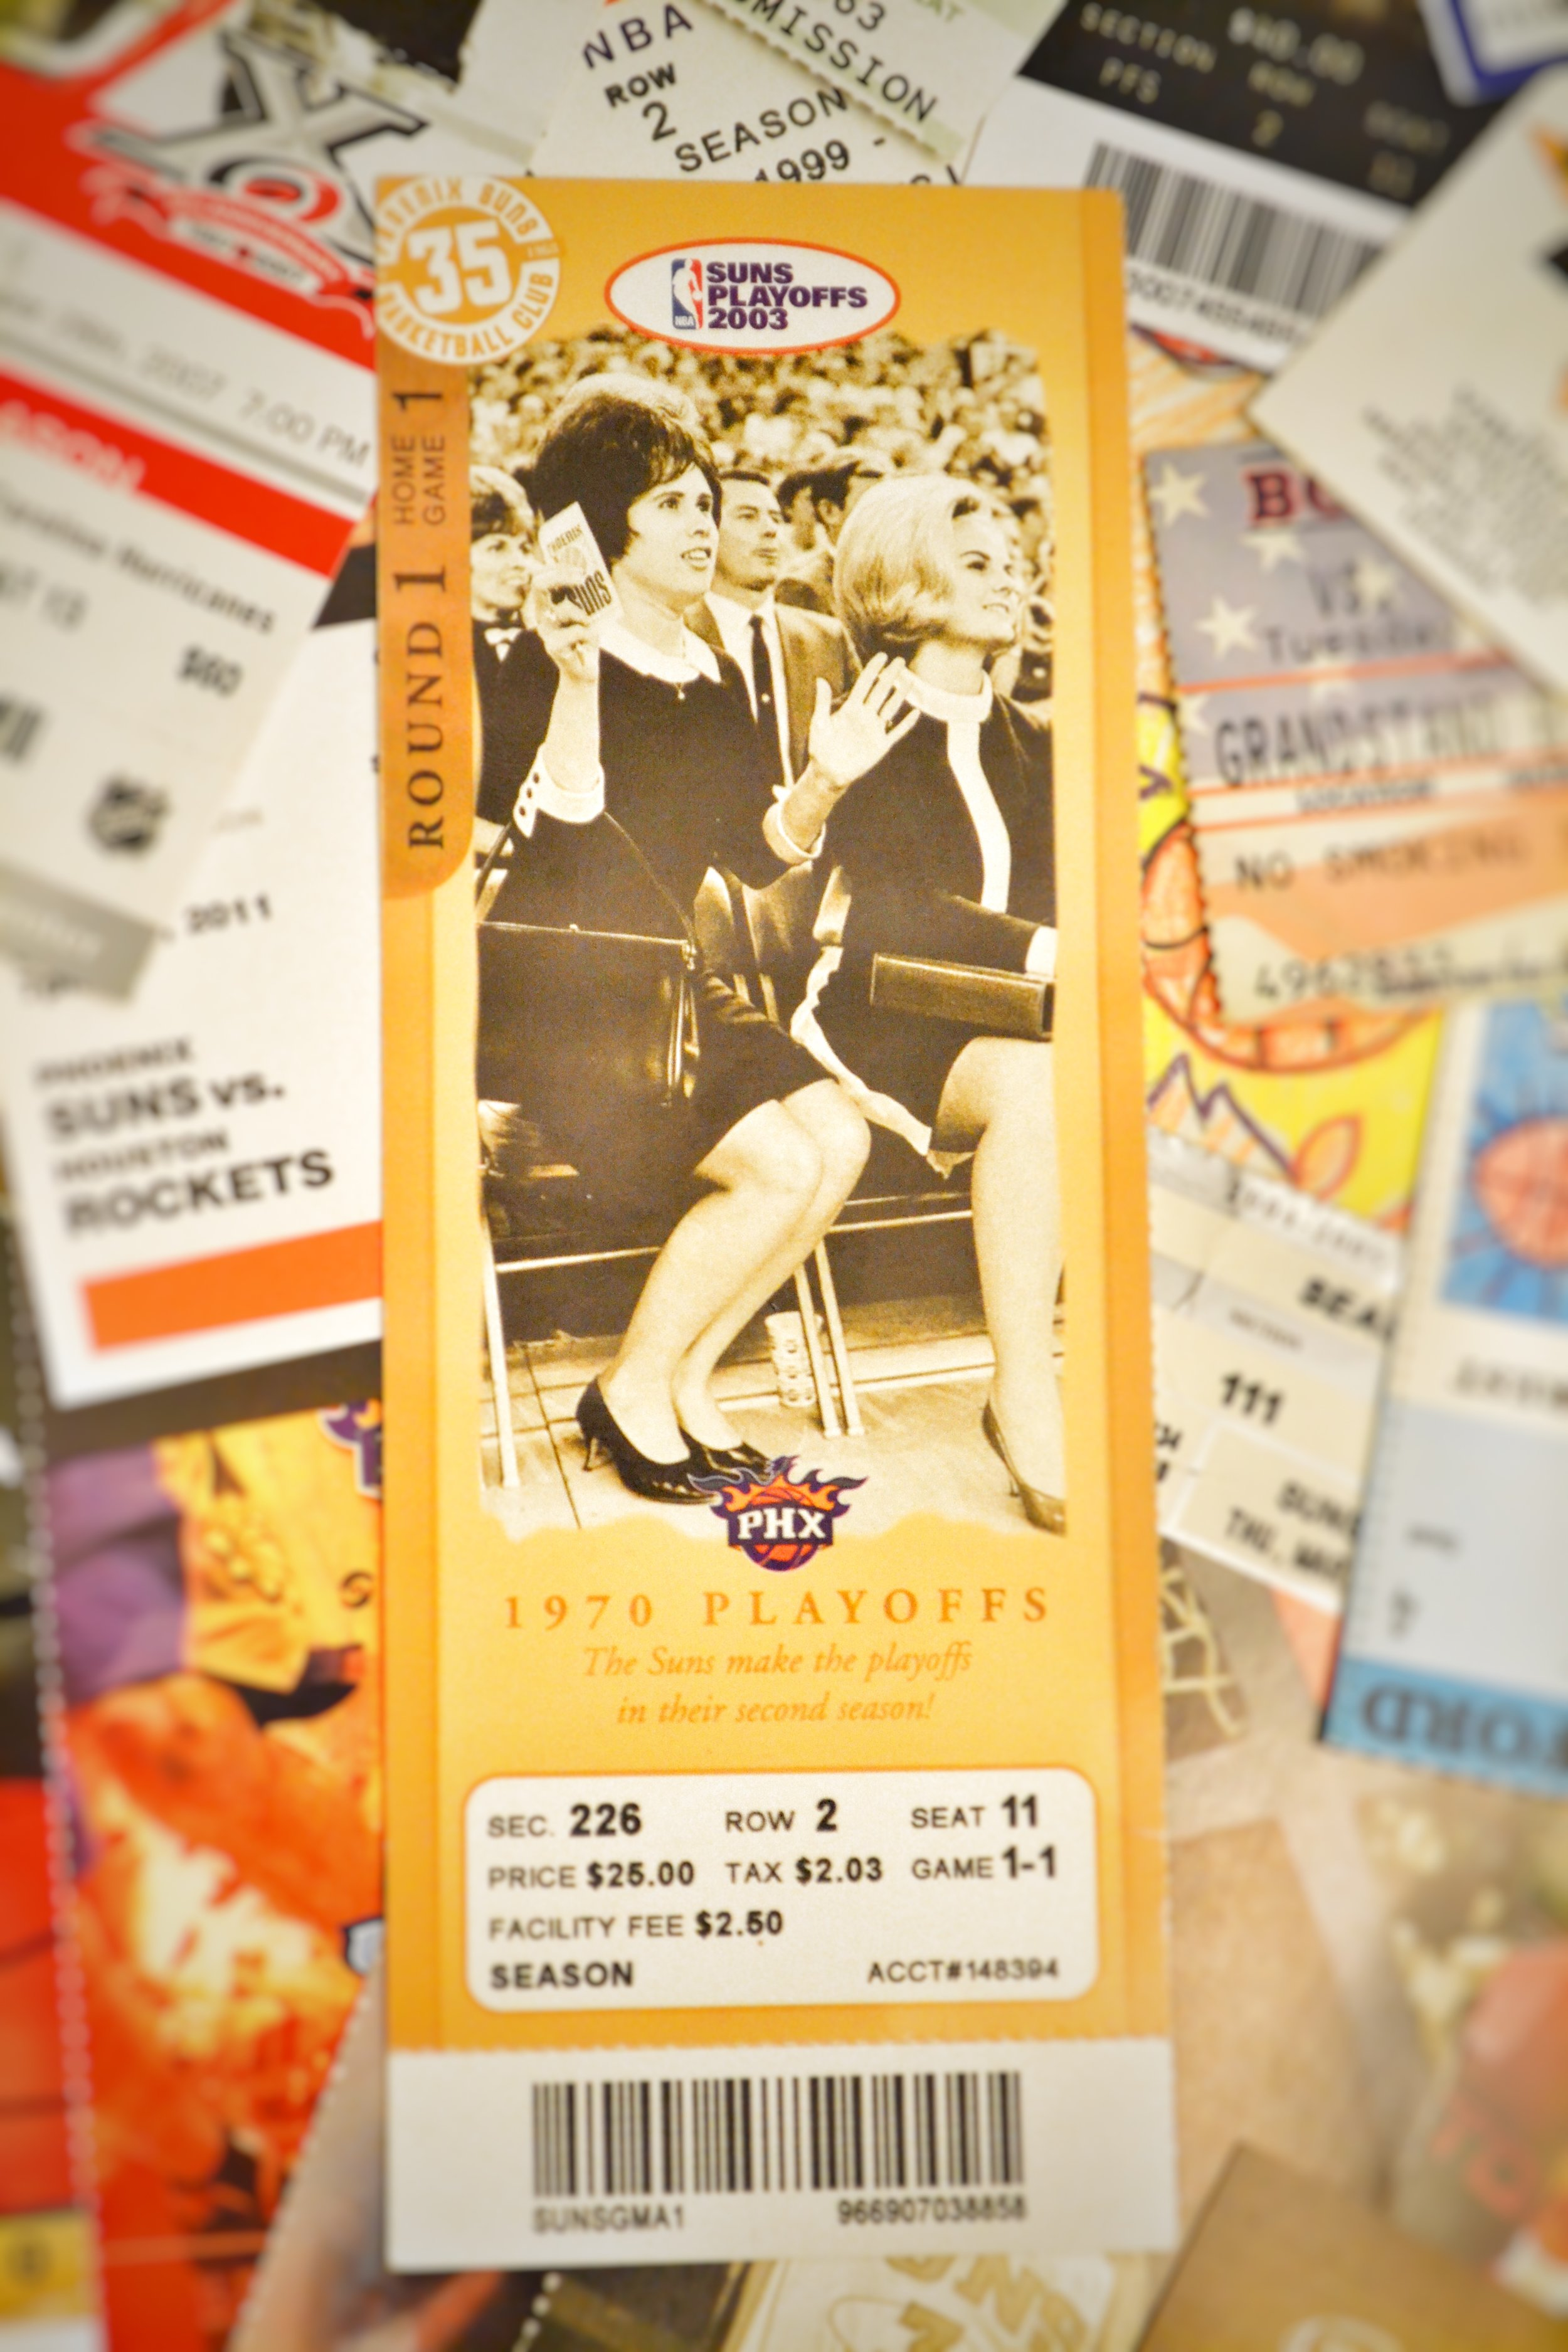 Spurs vs. Suns ticket